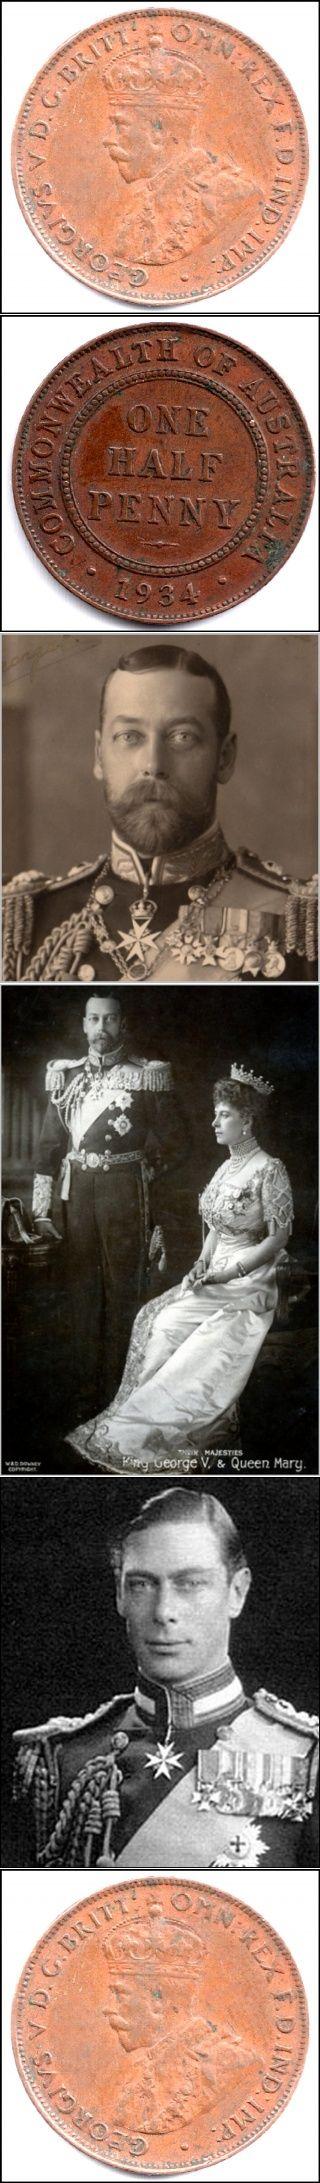 The King George V Australian 1934 Half Penny